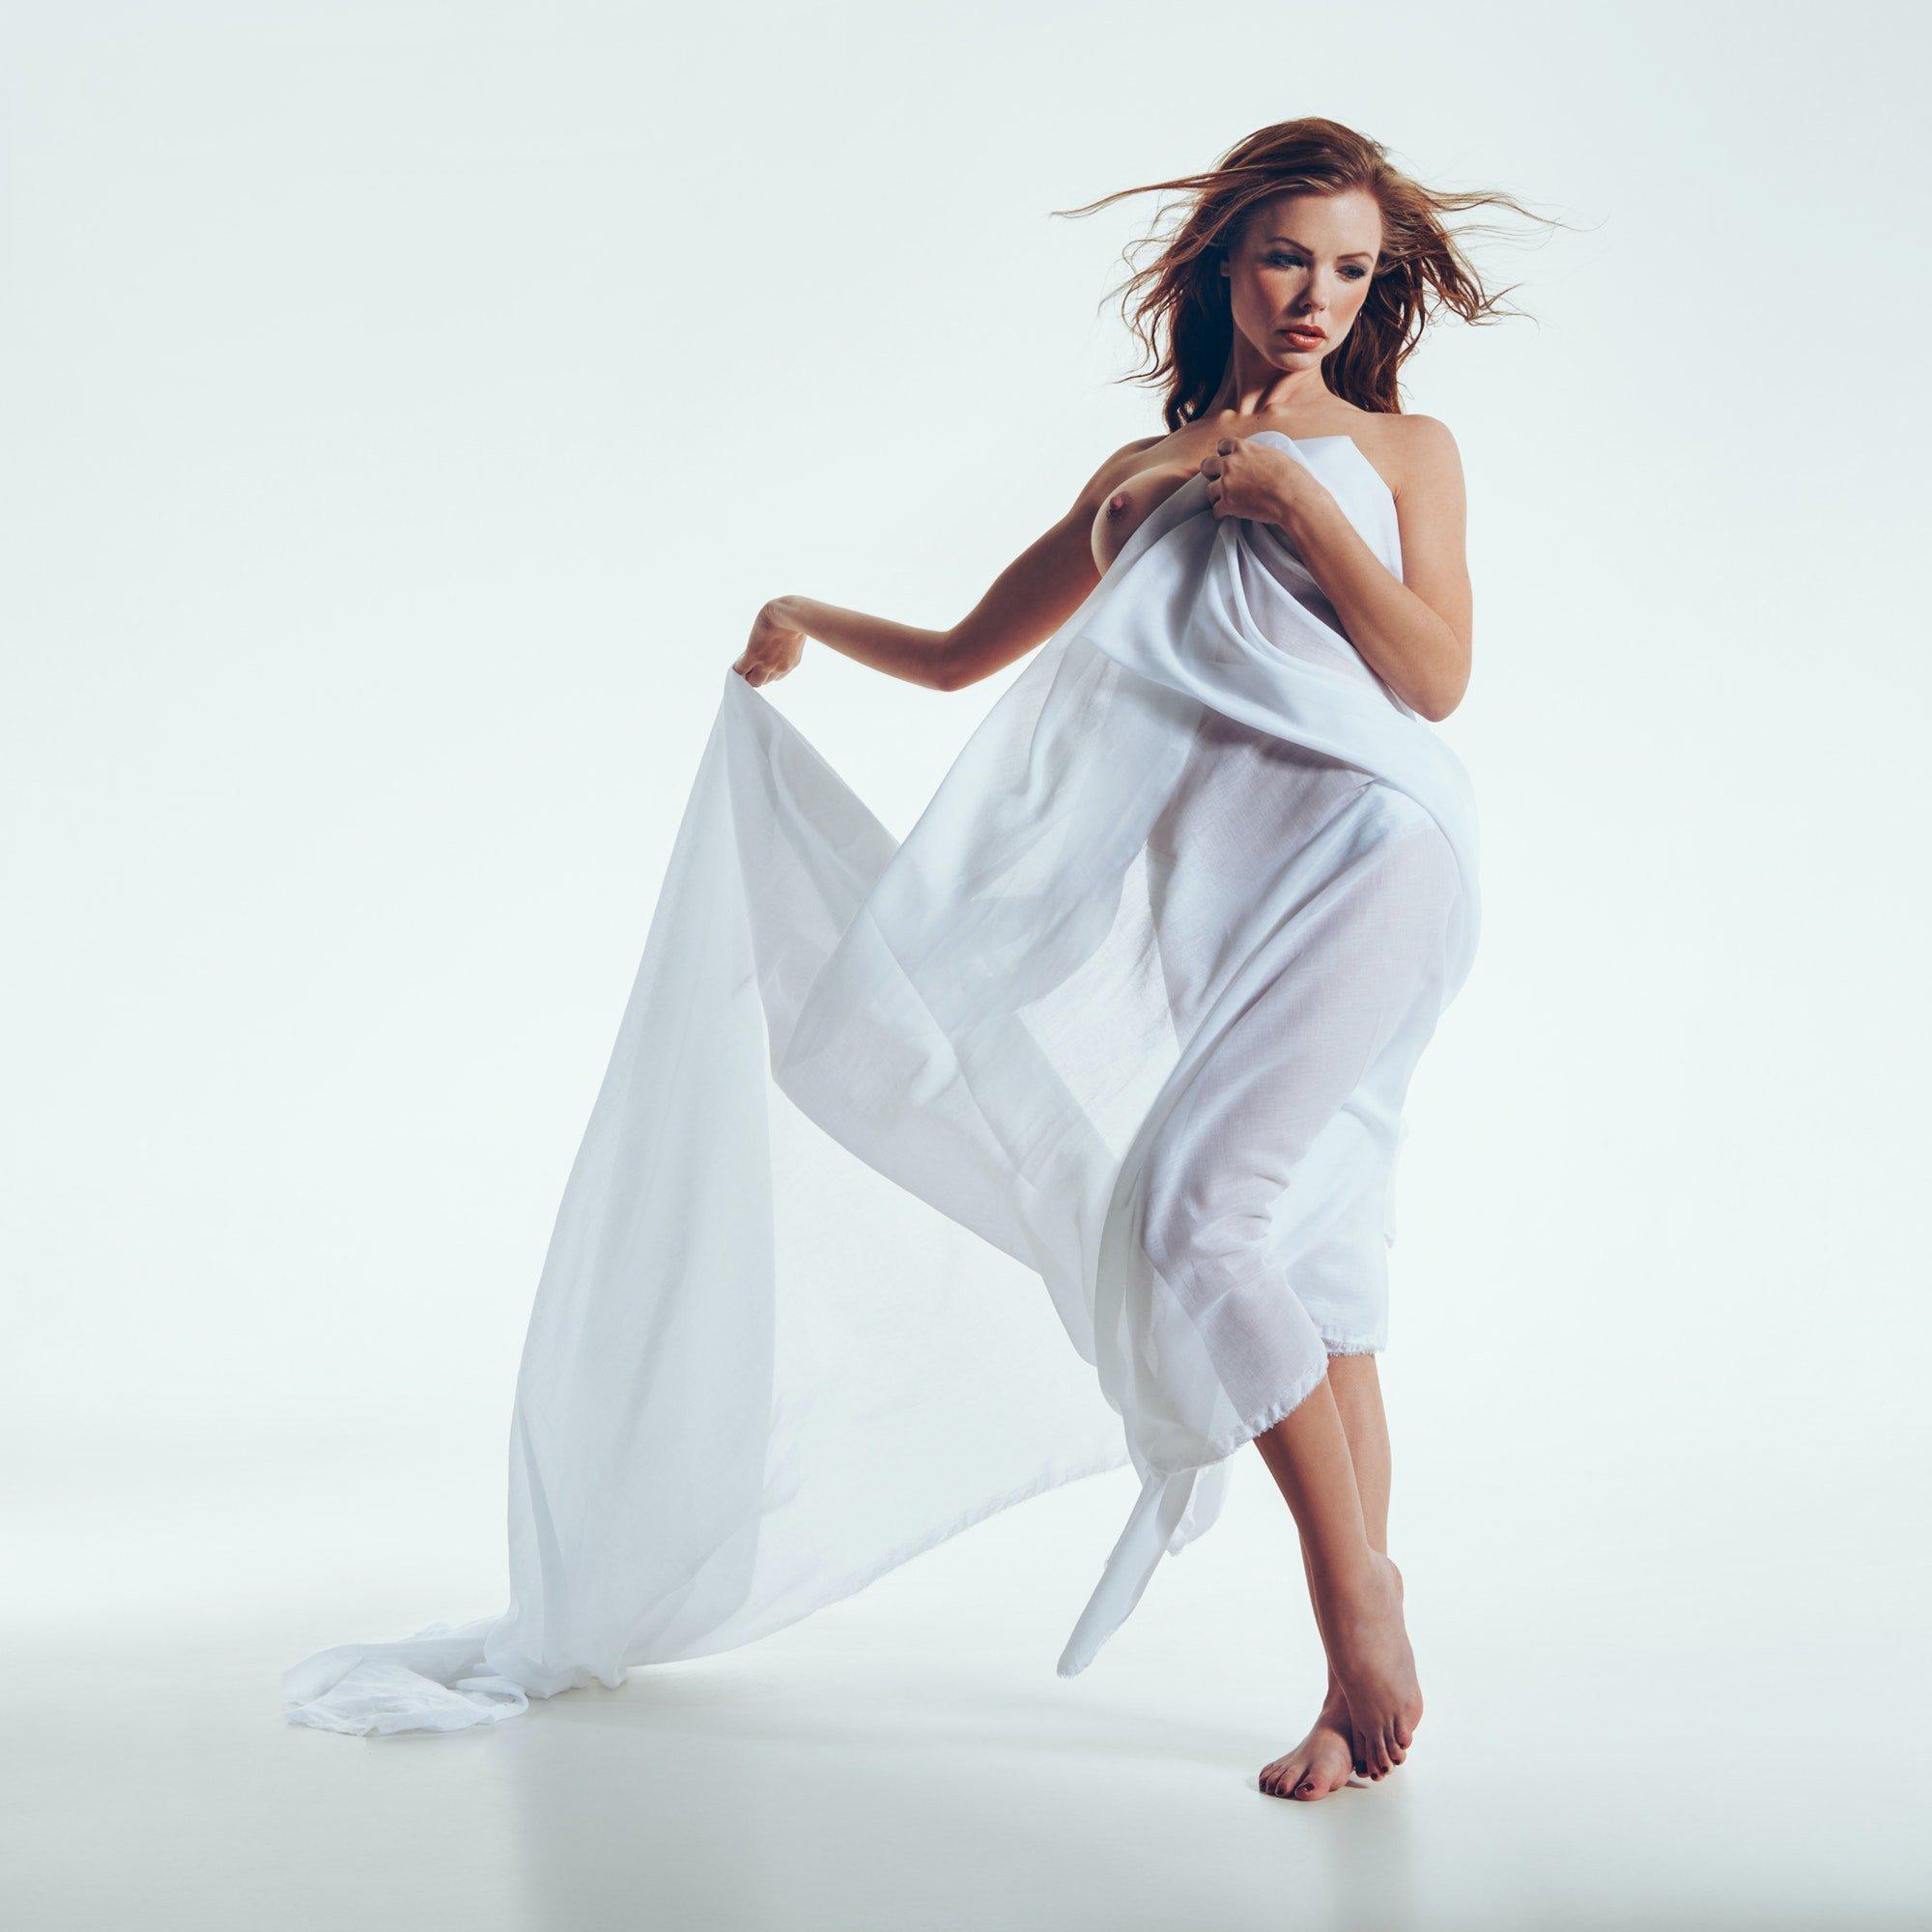 female-model-in-transparent-white-cloth.jpg